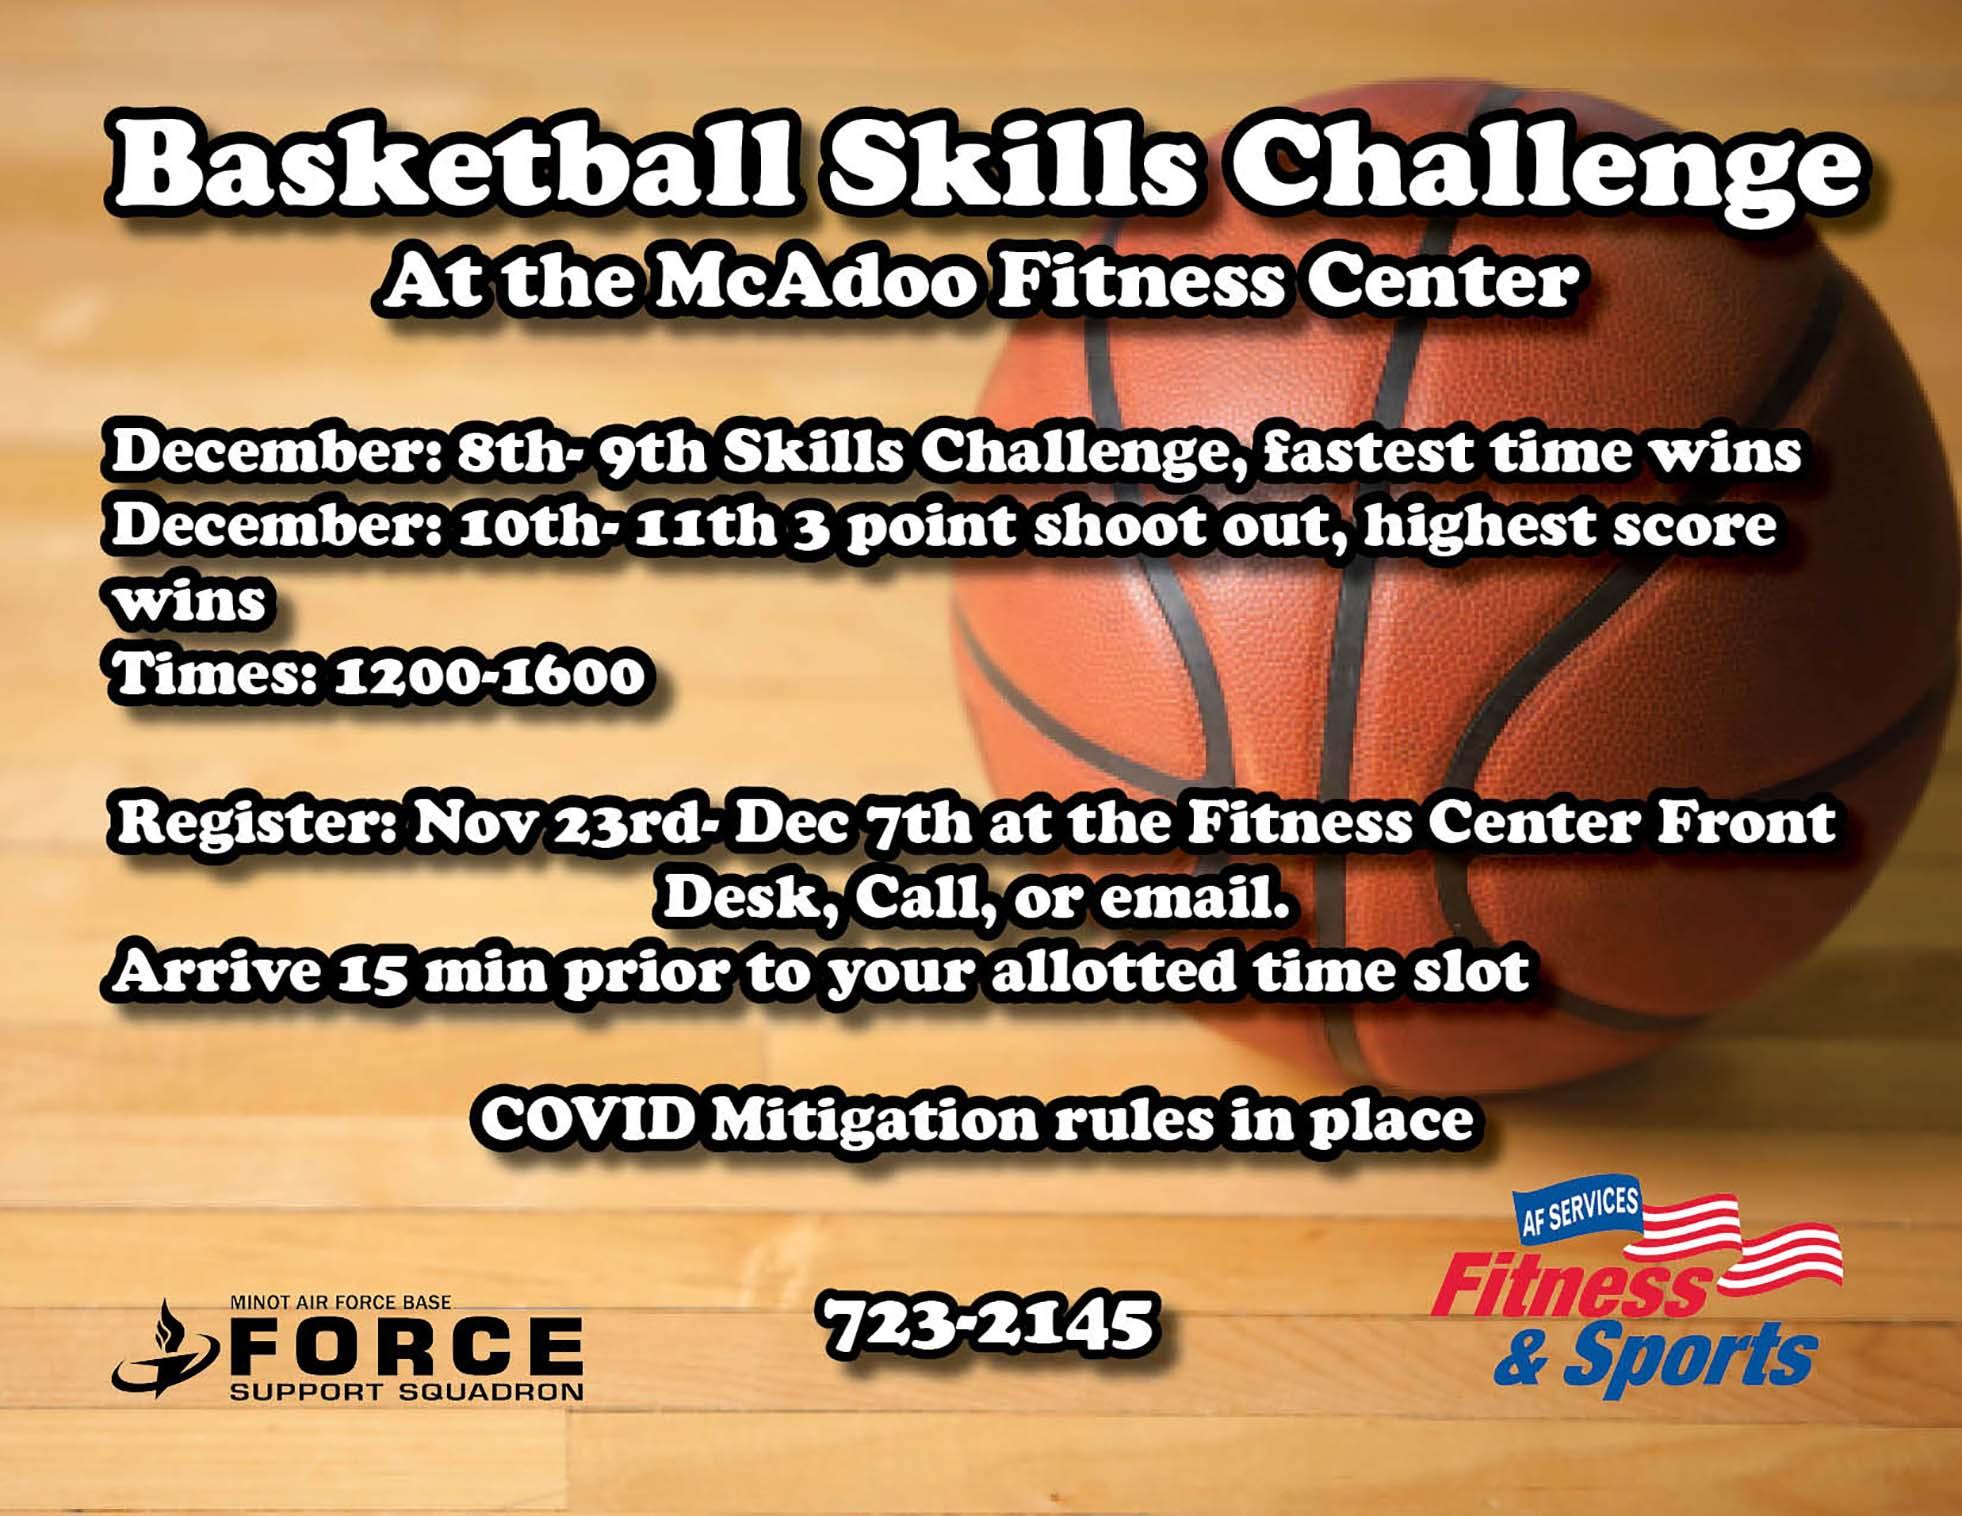 Registration Closes: Basketball Skills Challenge